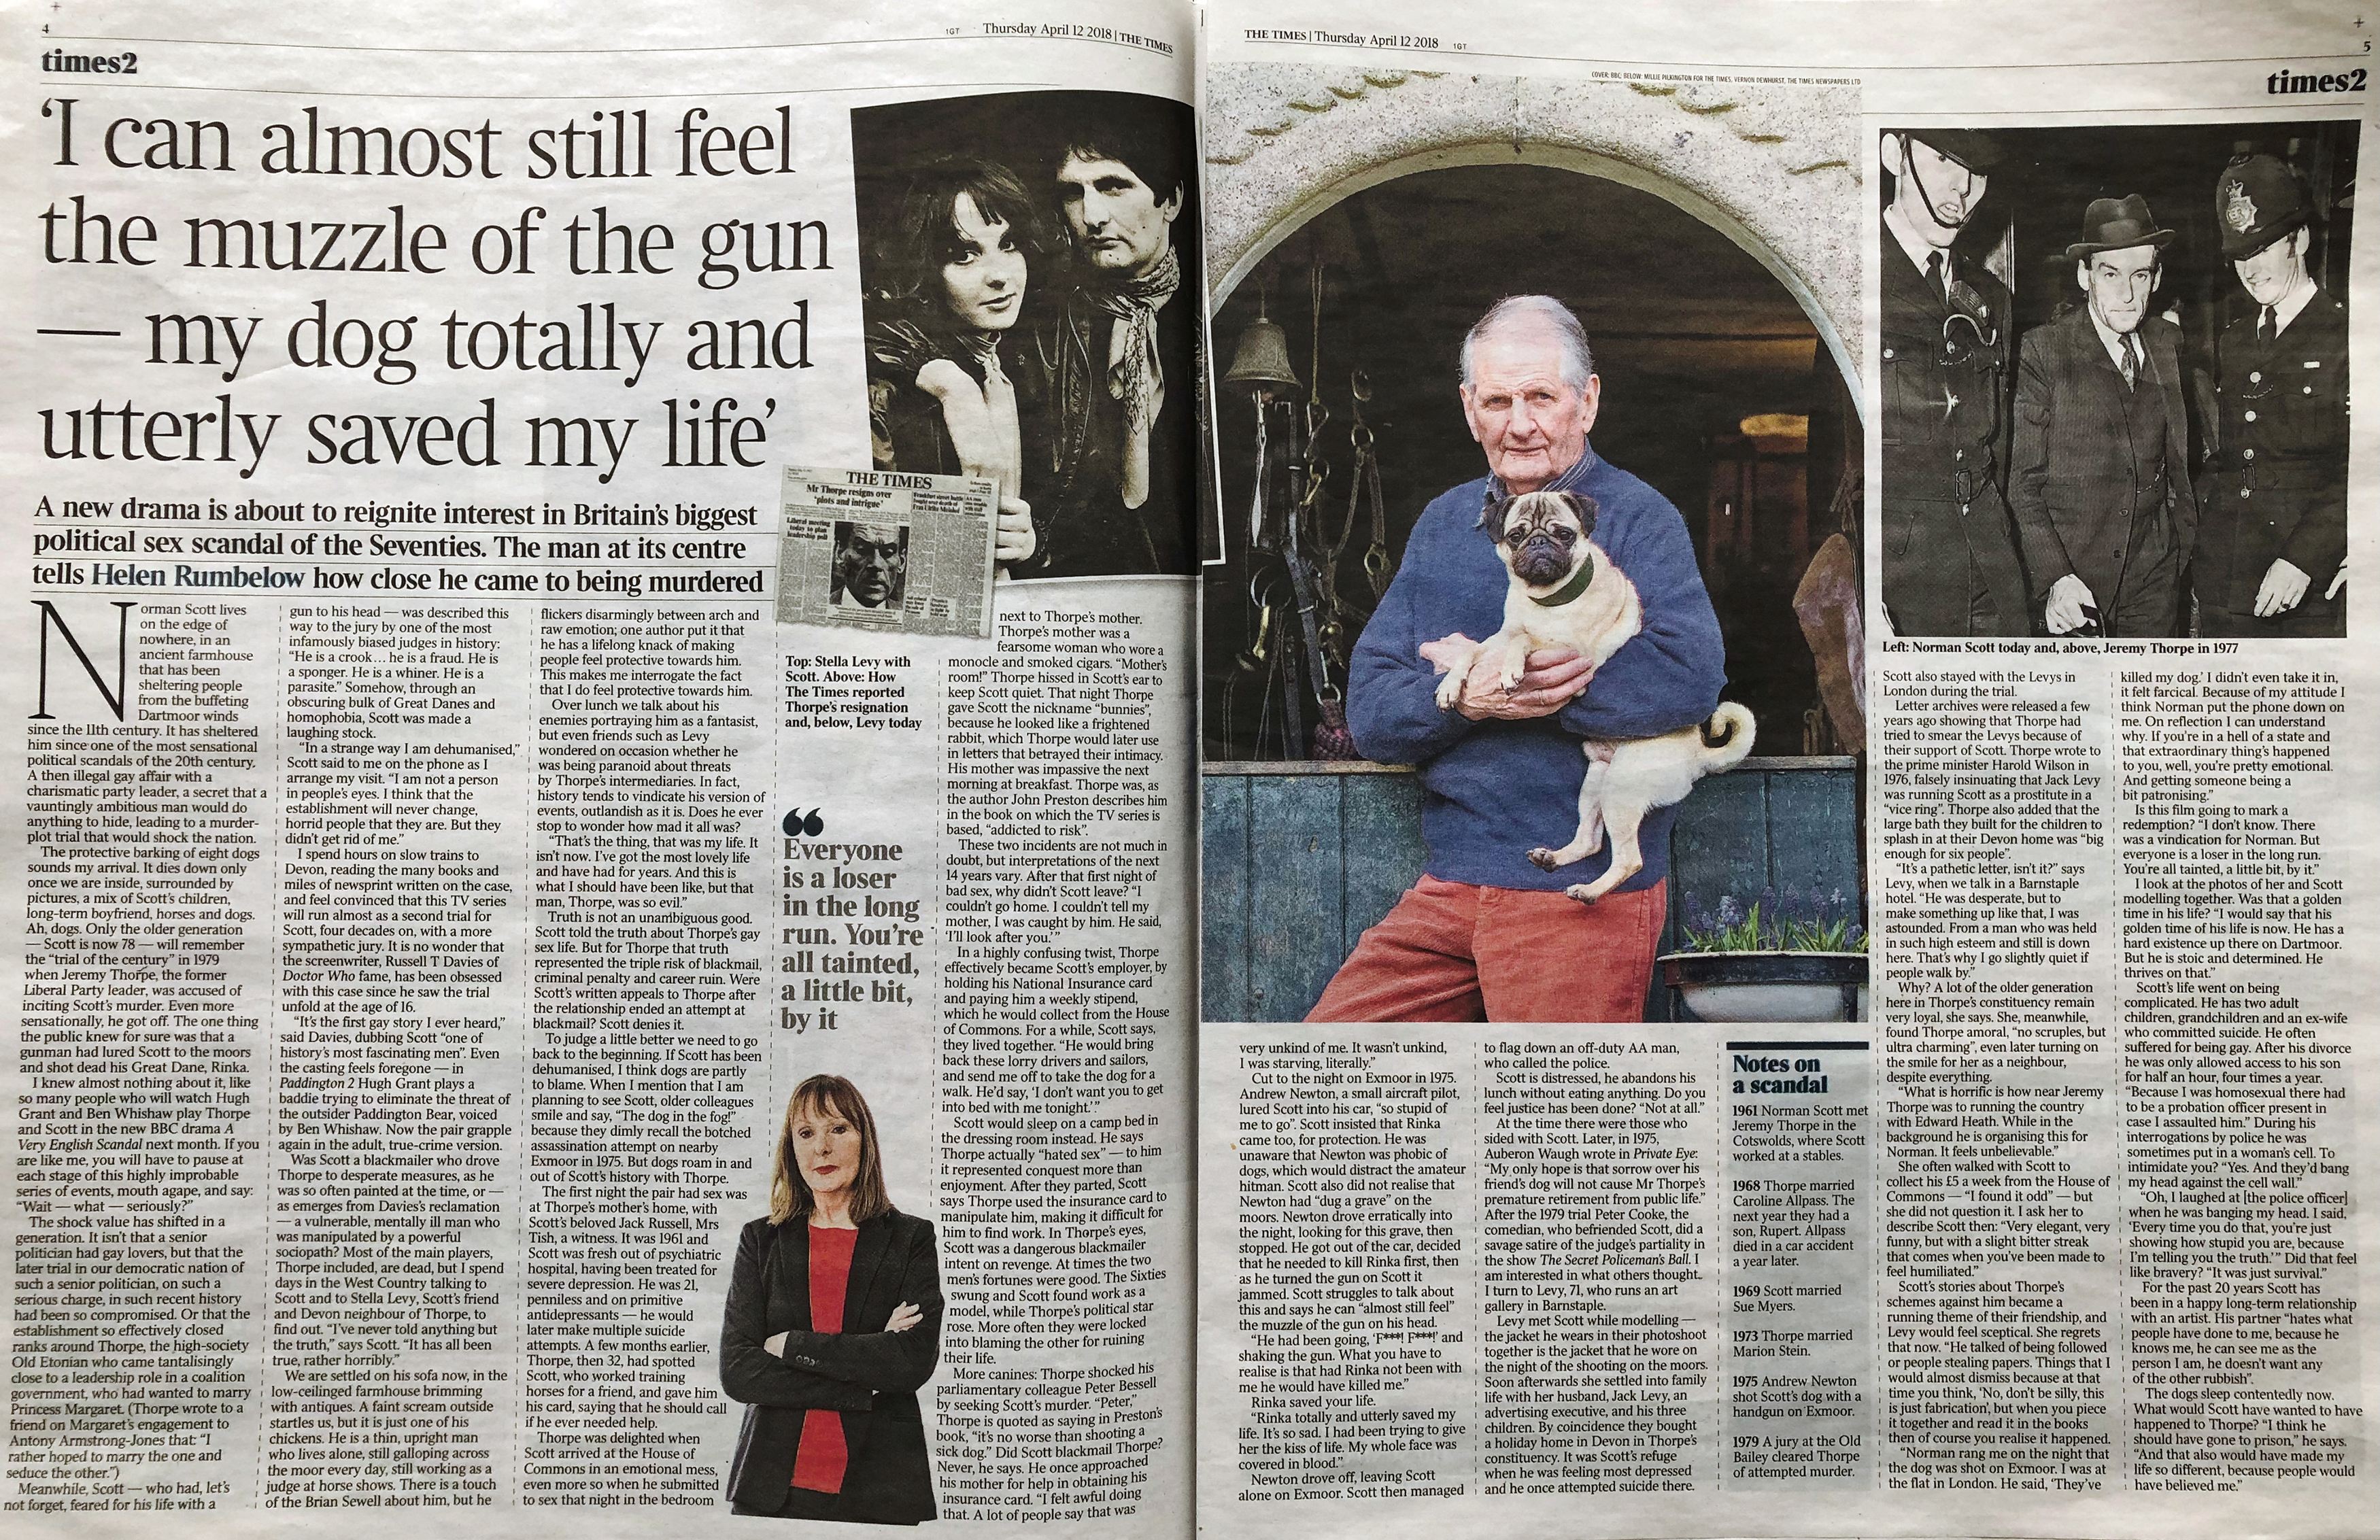 Norman Scott & Jeremy Thorpe Affair